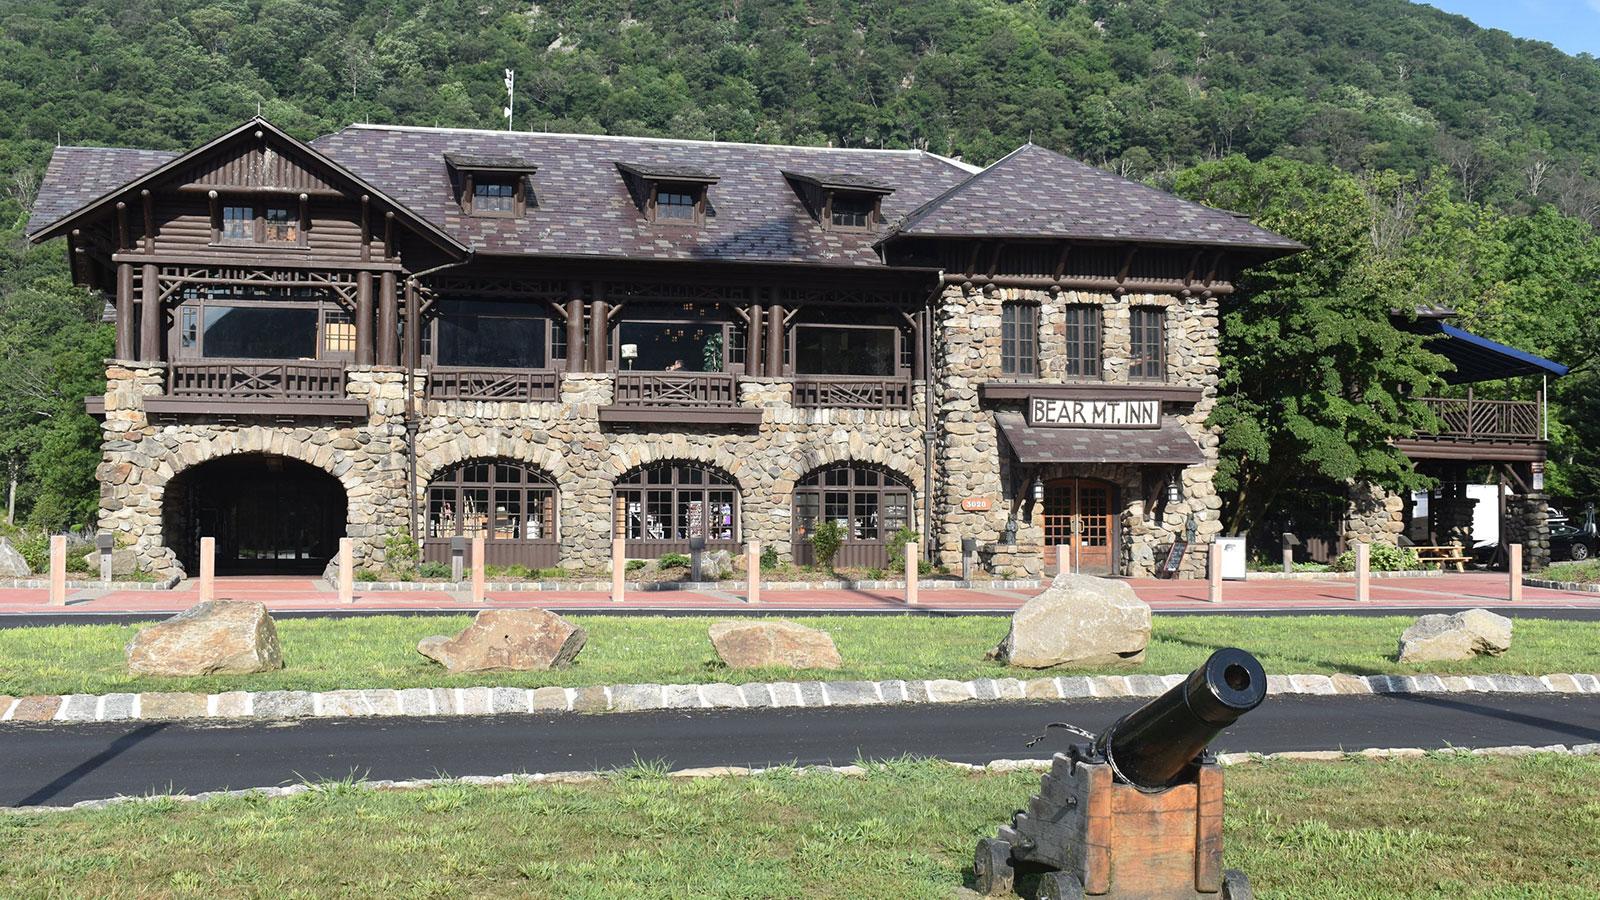 Image of Lake outside Bear Mountain Inn, 1915, Member of Historic Hotels of America, in Bear Mountain, New York, Hot Deals